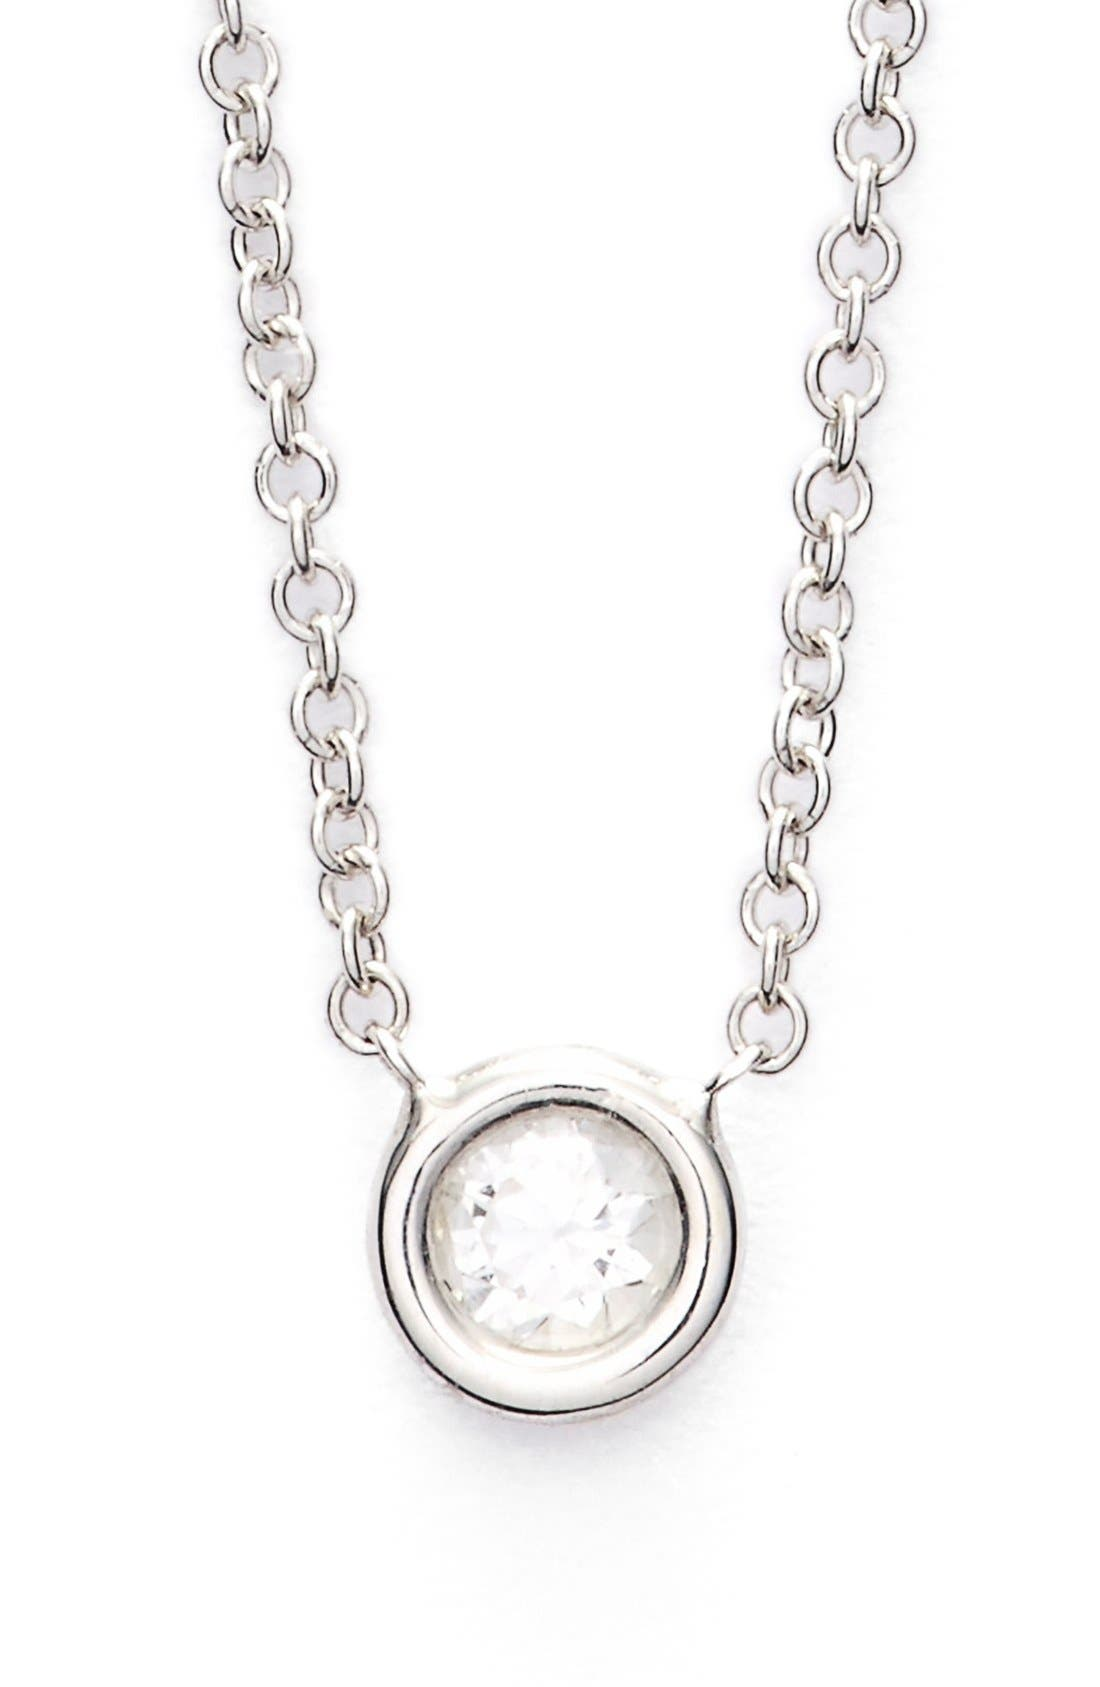 Small Diamond Solitaire Pendant Necklace,                         Main,                         color, White Gold